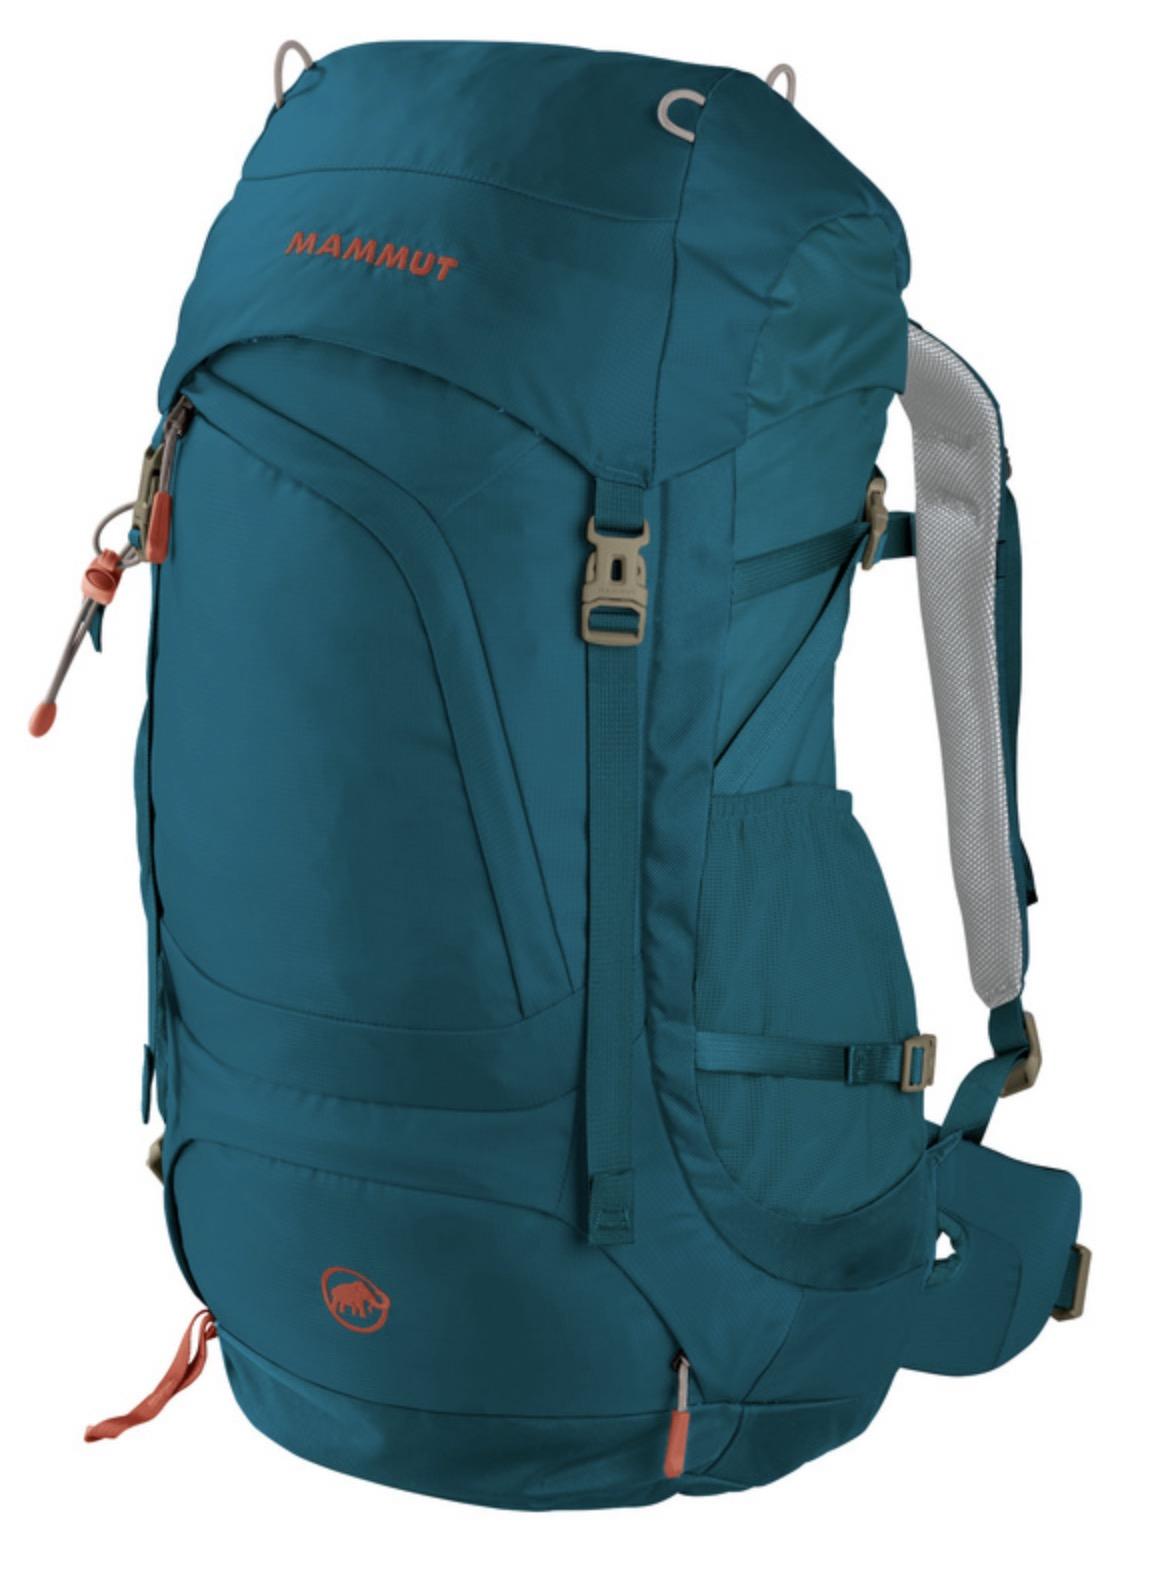 Mammut - Crea Pro 28 L - Hiking backpack - Women's